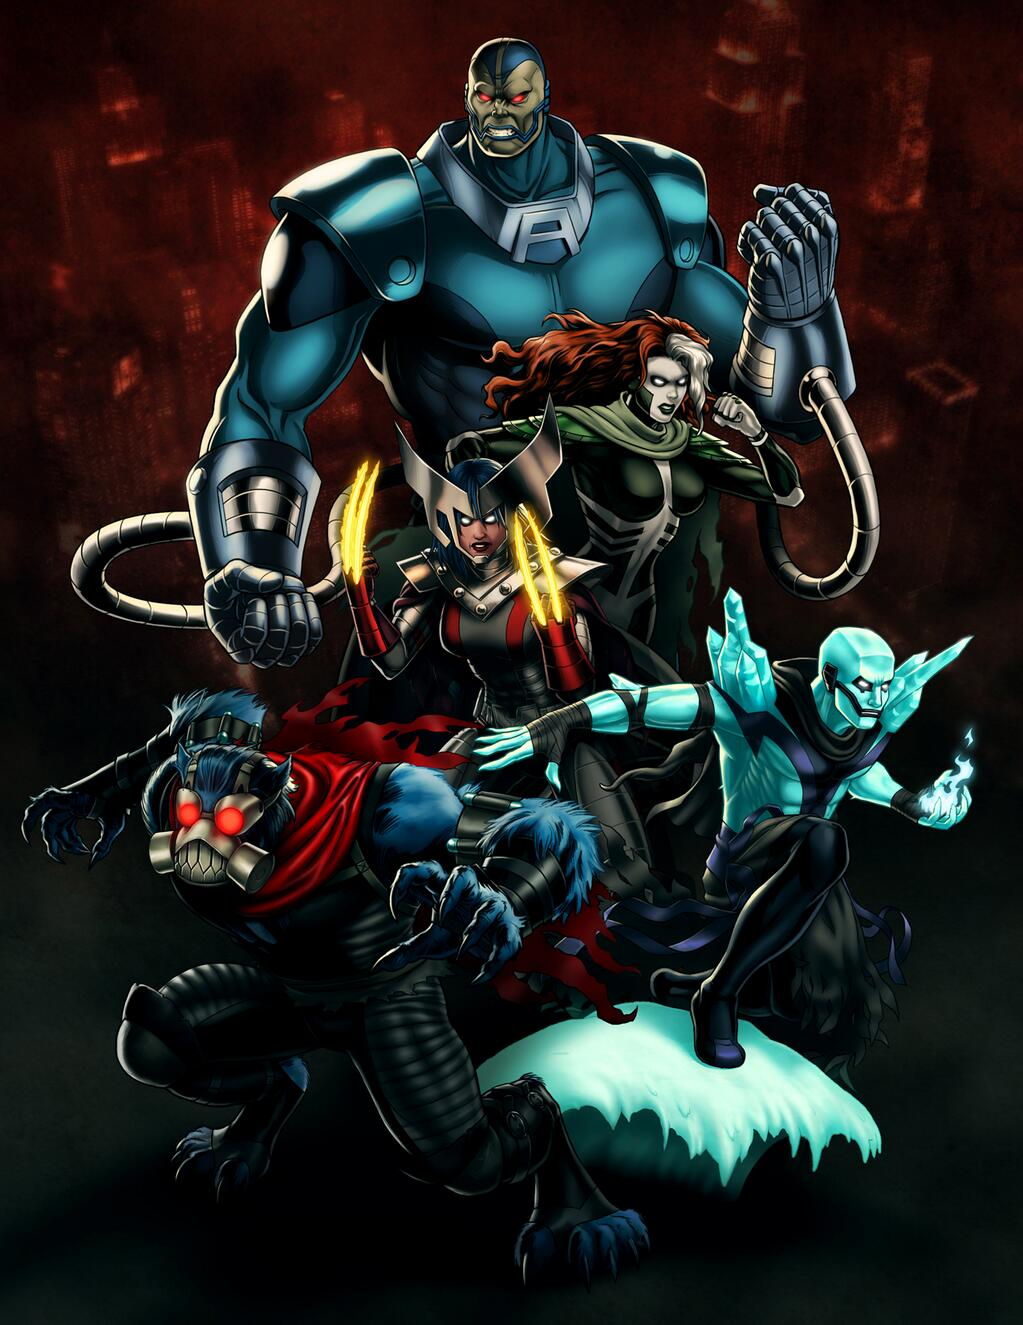 Horsemen of Apocalypse | Marvel: Avengers Alliance Wiki